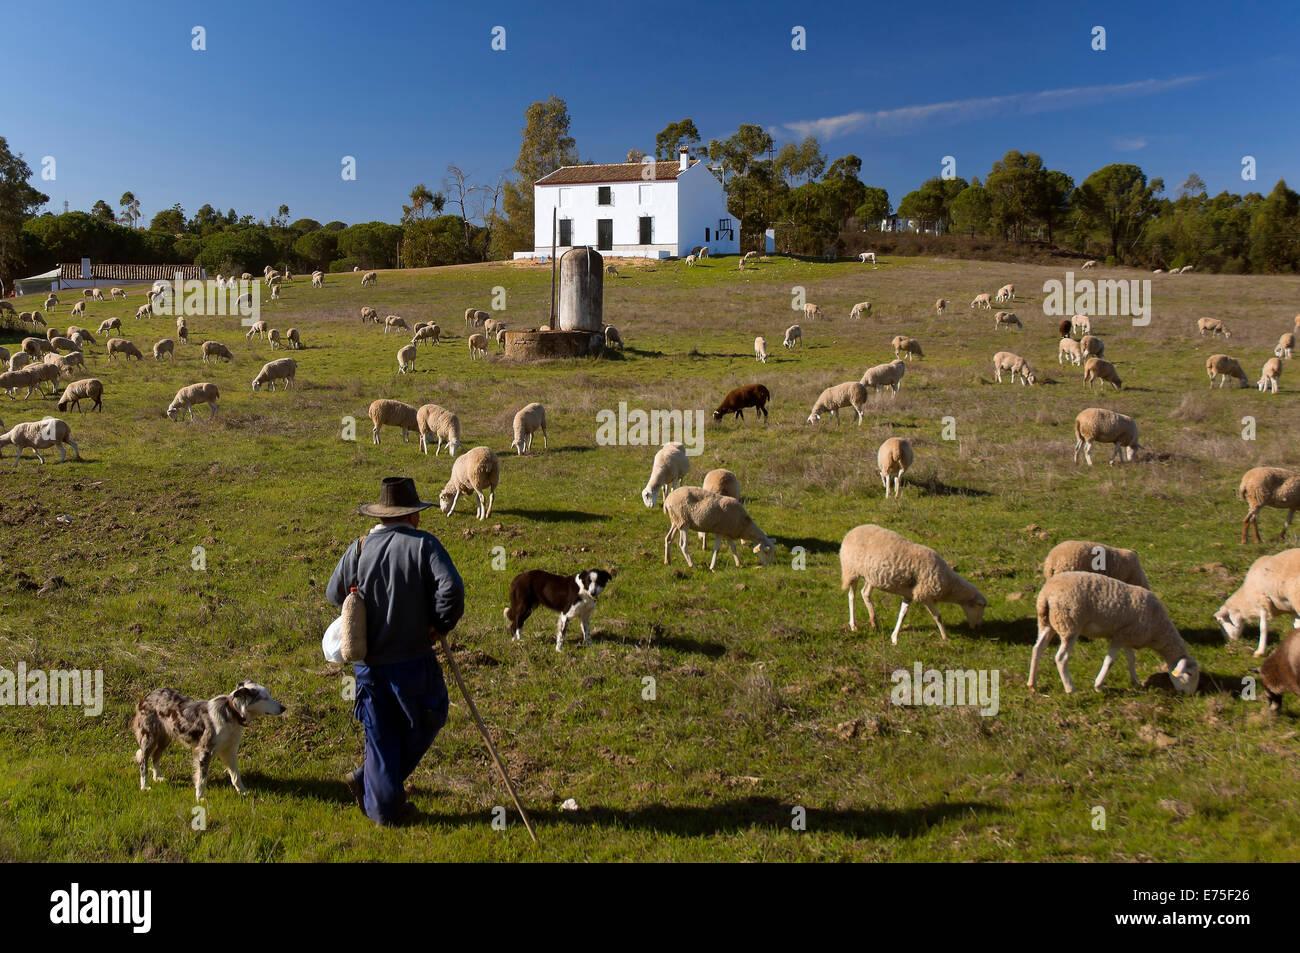 Sheep and shepherd, Beas, Huelva province, Region of Andalusia, Spain, Europe - Stock Image